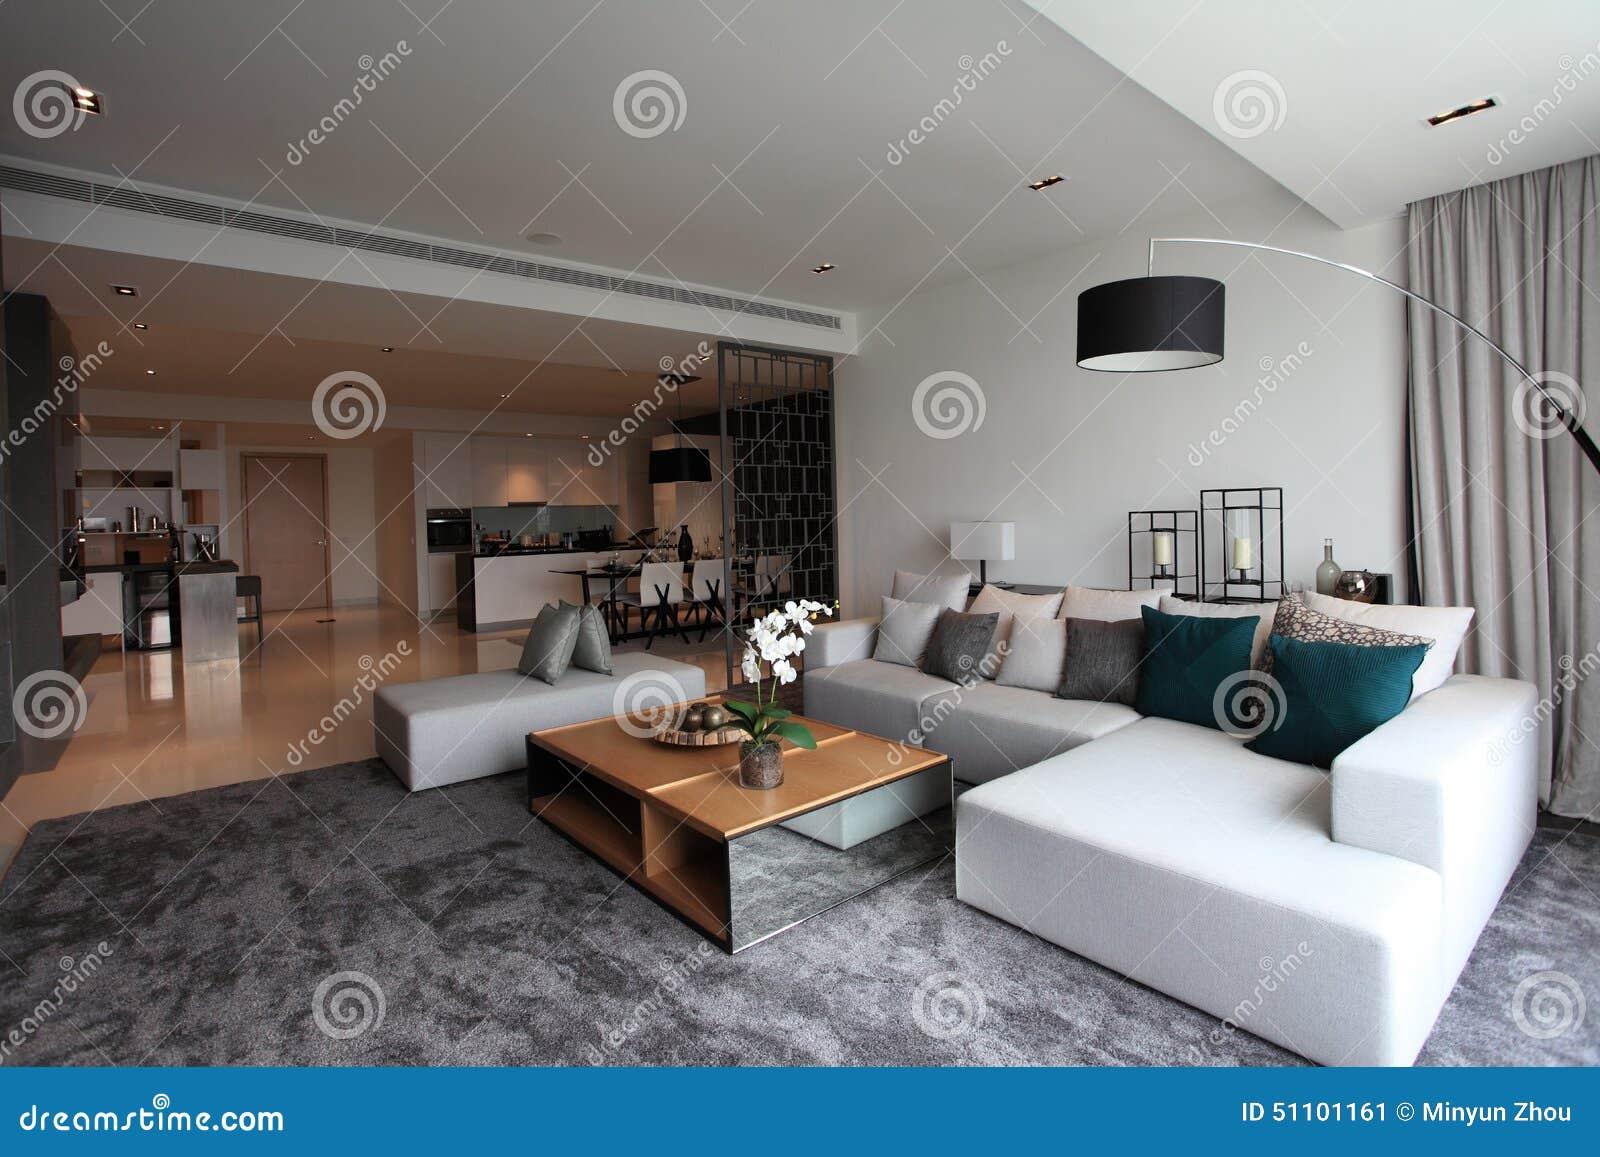 living room design kuala lumpur  Living Room In Luxury Condo In Kuala Lumpur Editorial Photo - Image ...